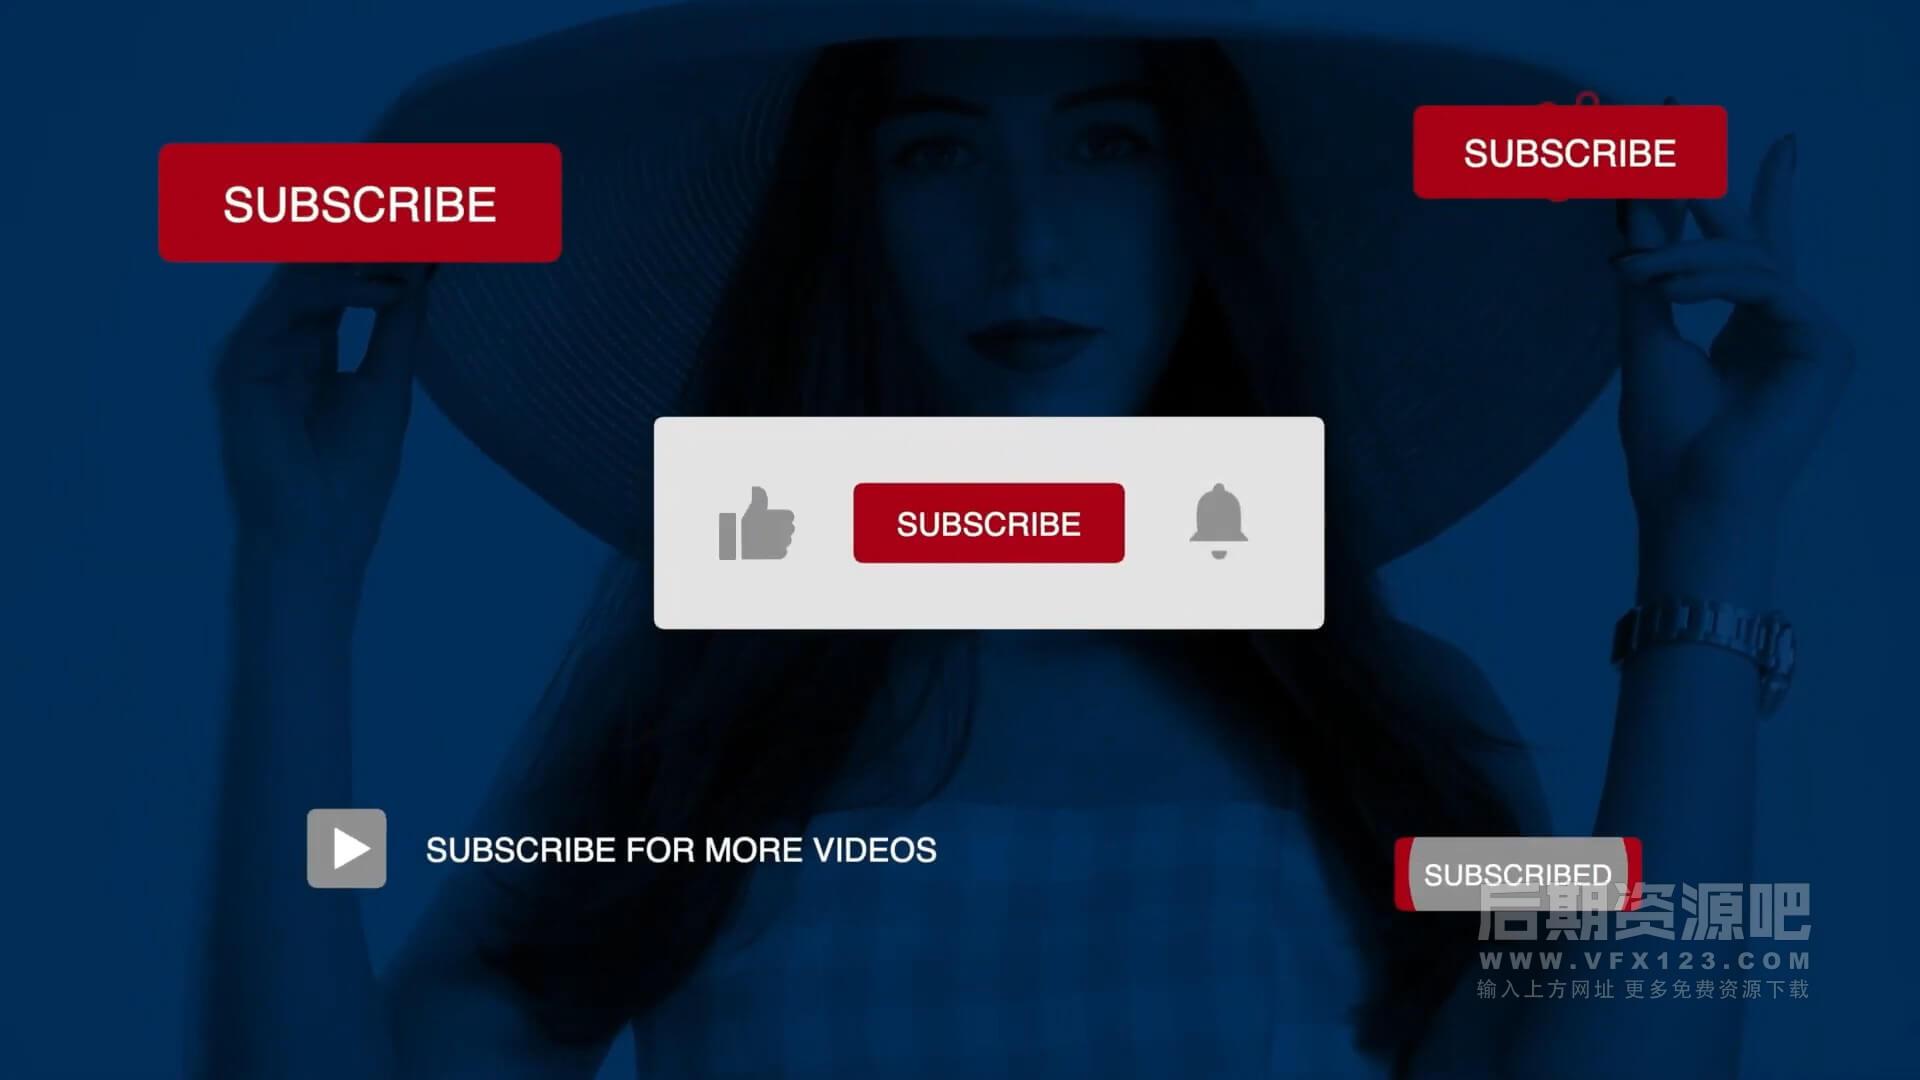 fcpx插件 自媒体博主影片制作常用工具包 点赞订阅片头片尾预告转场画中画等 Vlogger